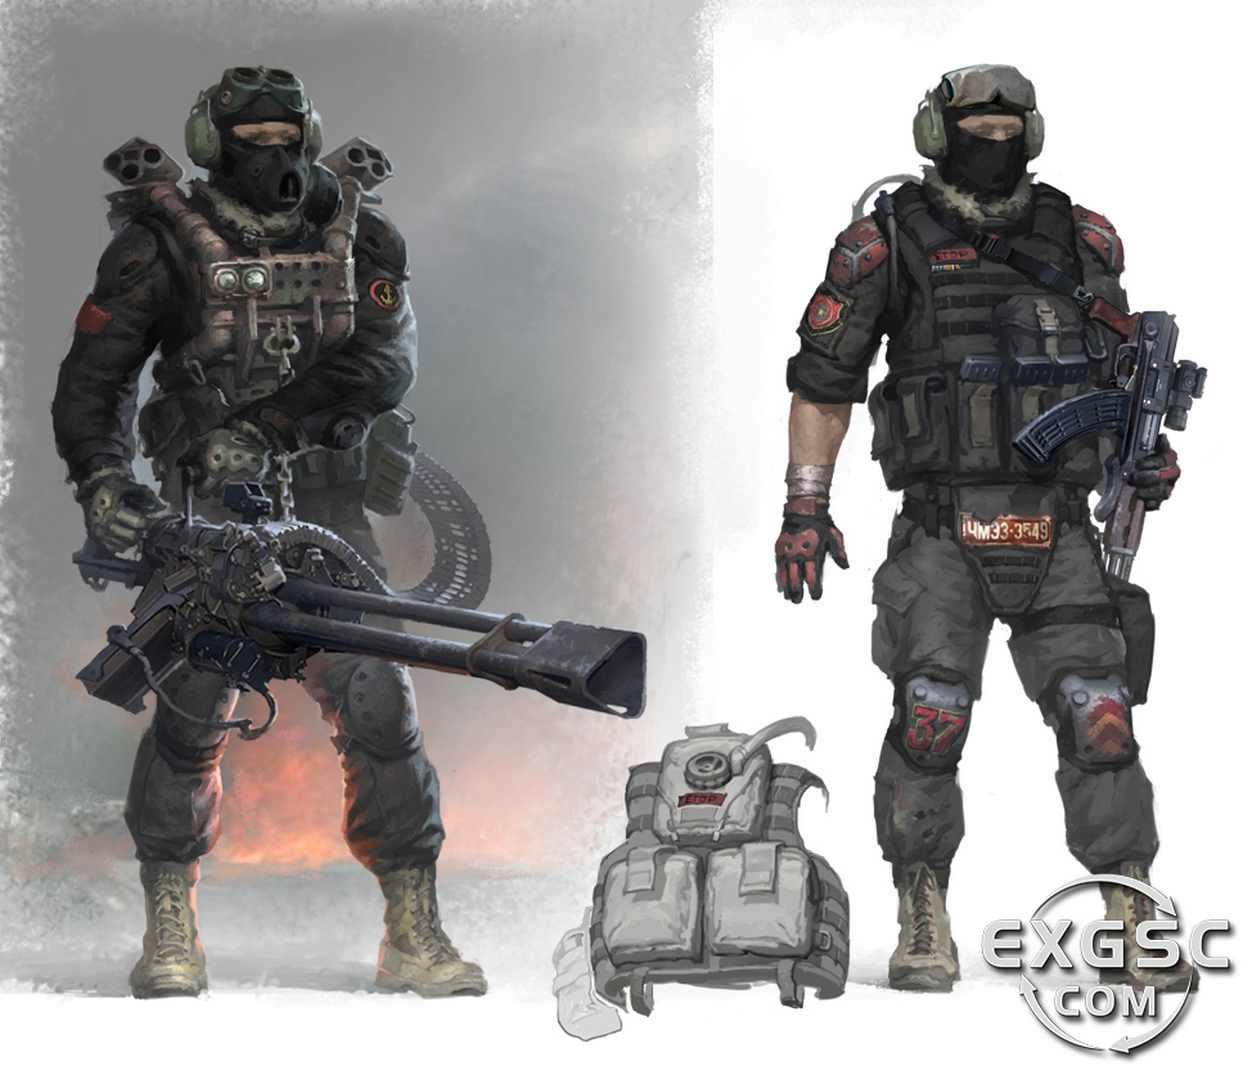 S.T.A.L.K.E.R. 2 Concept Art - S.T.A.L.K.E.R. 2 арт